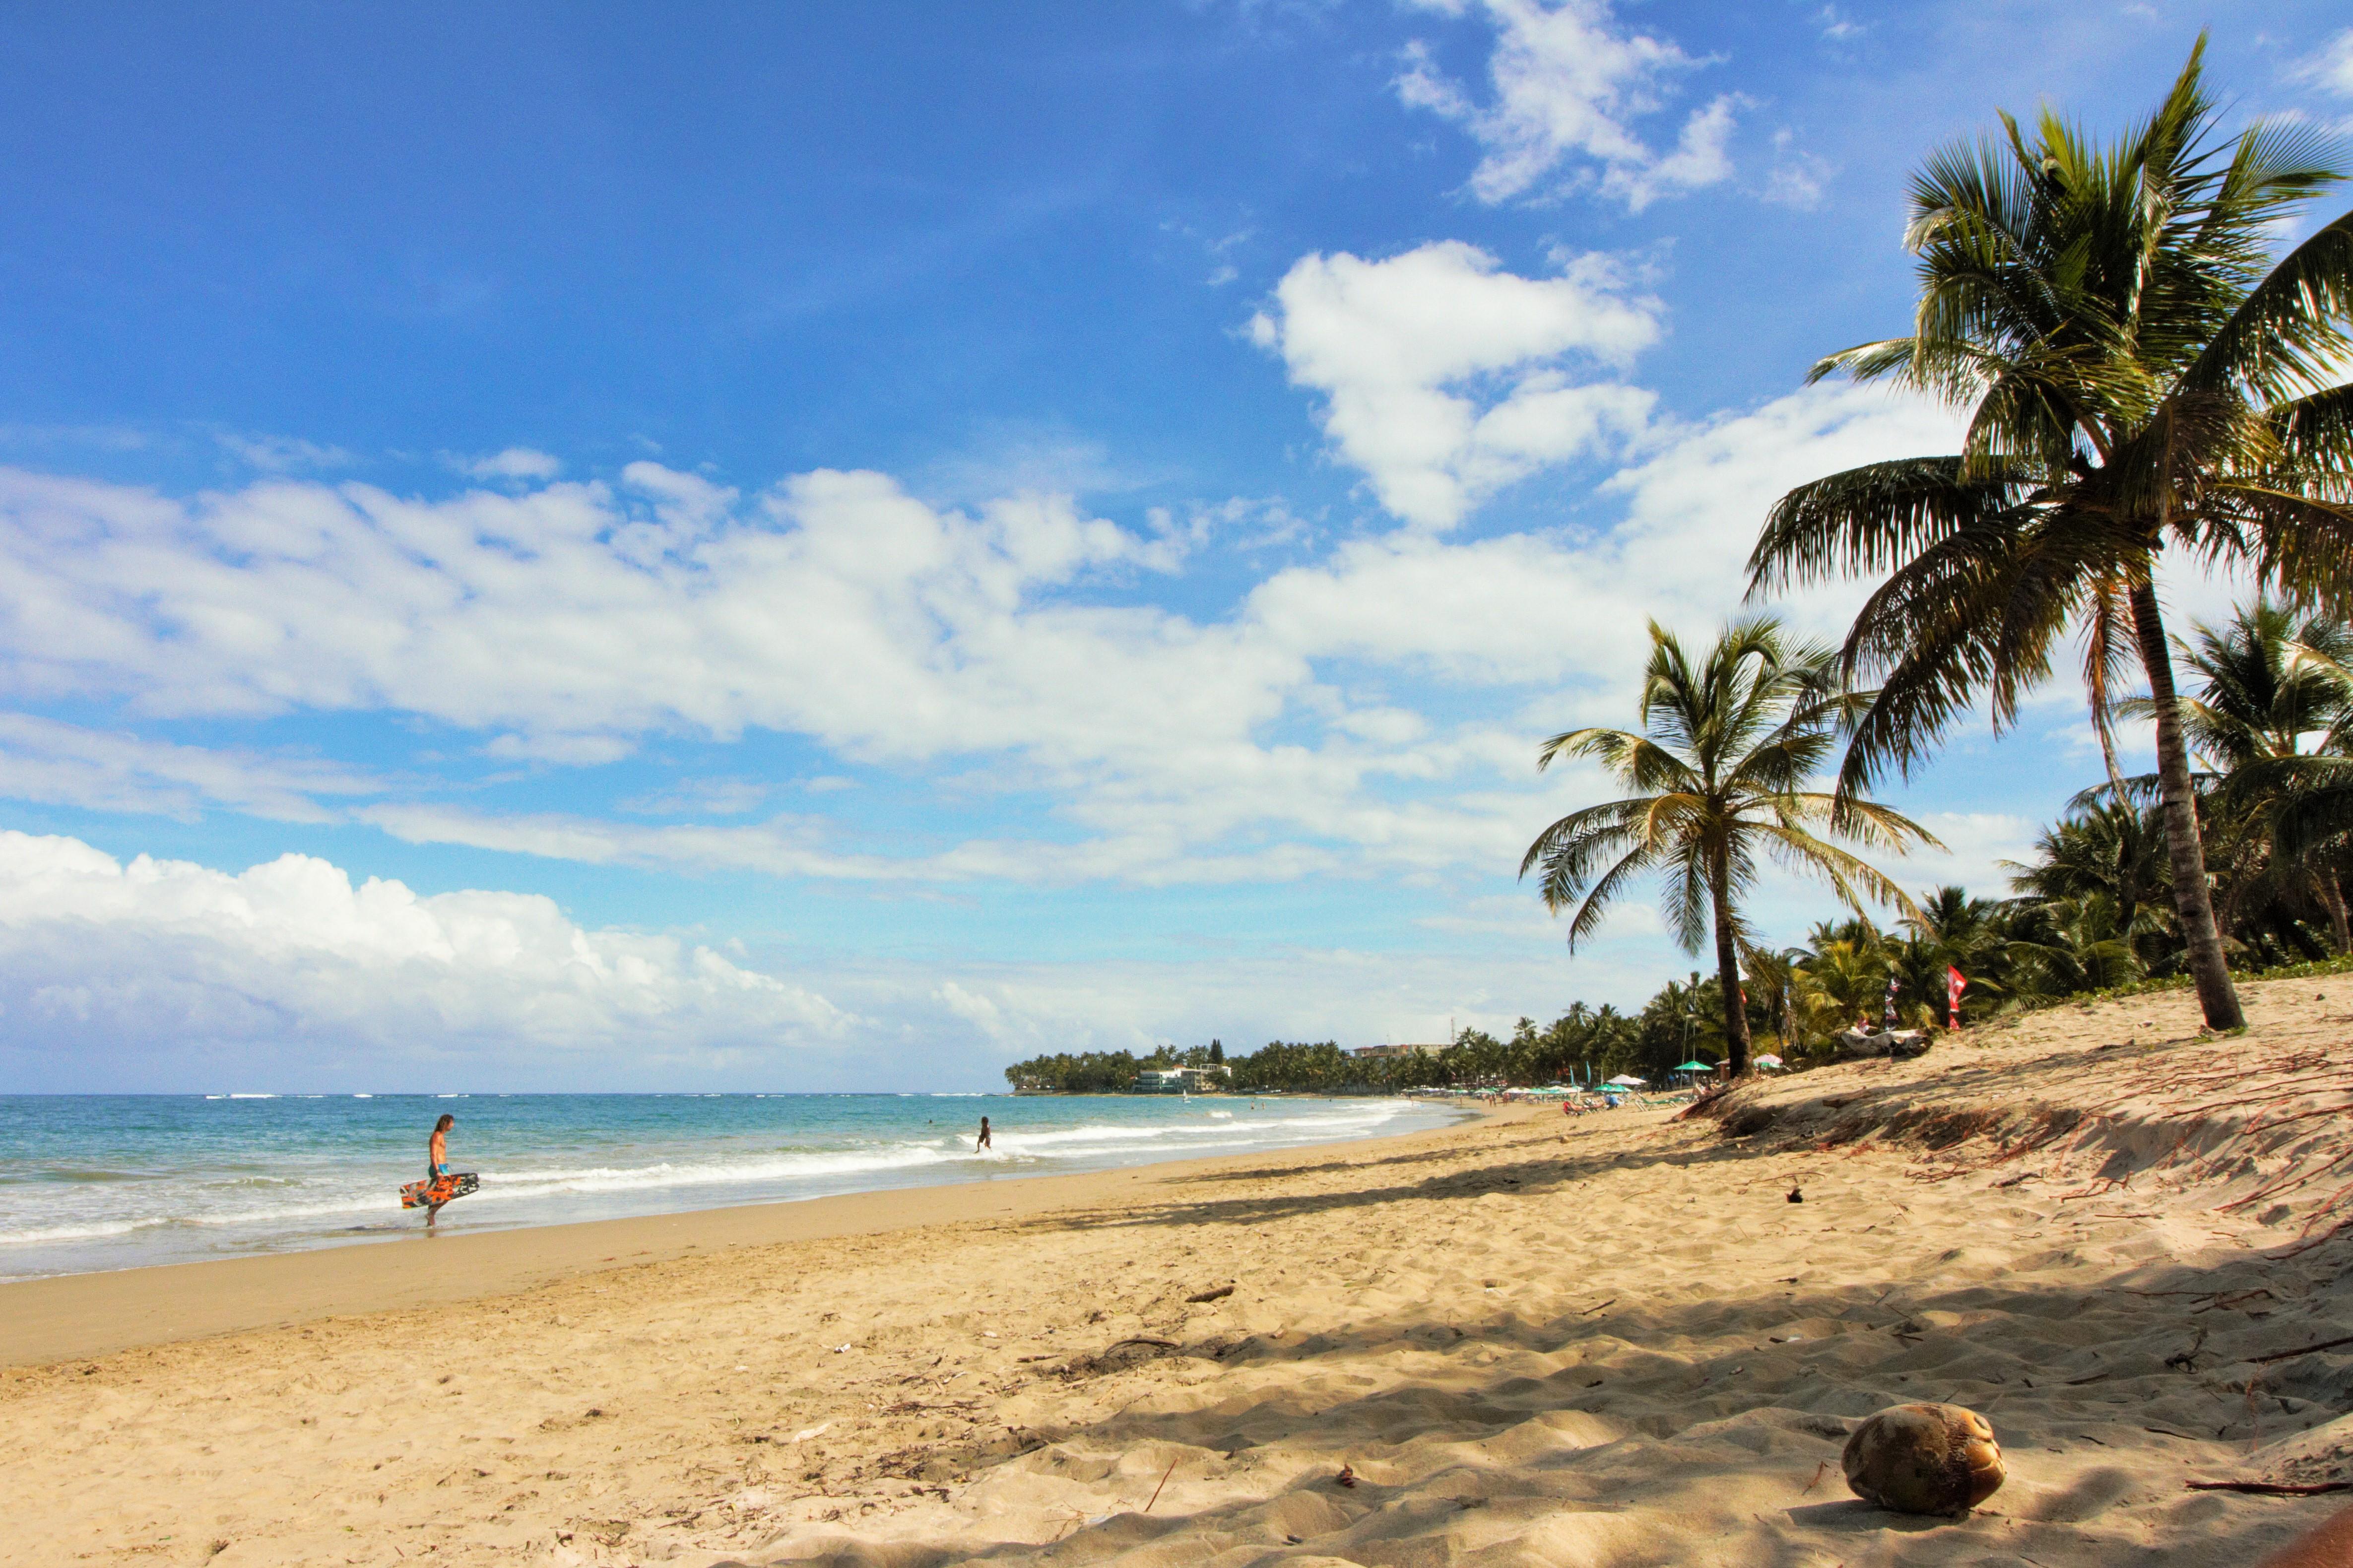 Виндсерфинг в Кабарете — обзор станций на пляже.